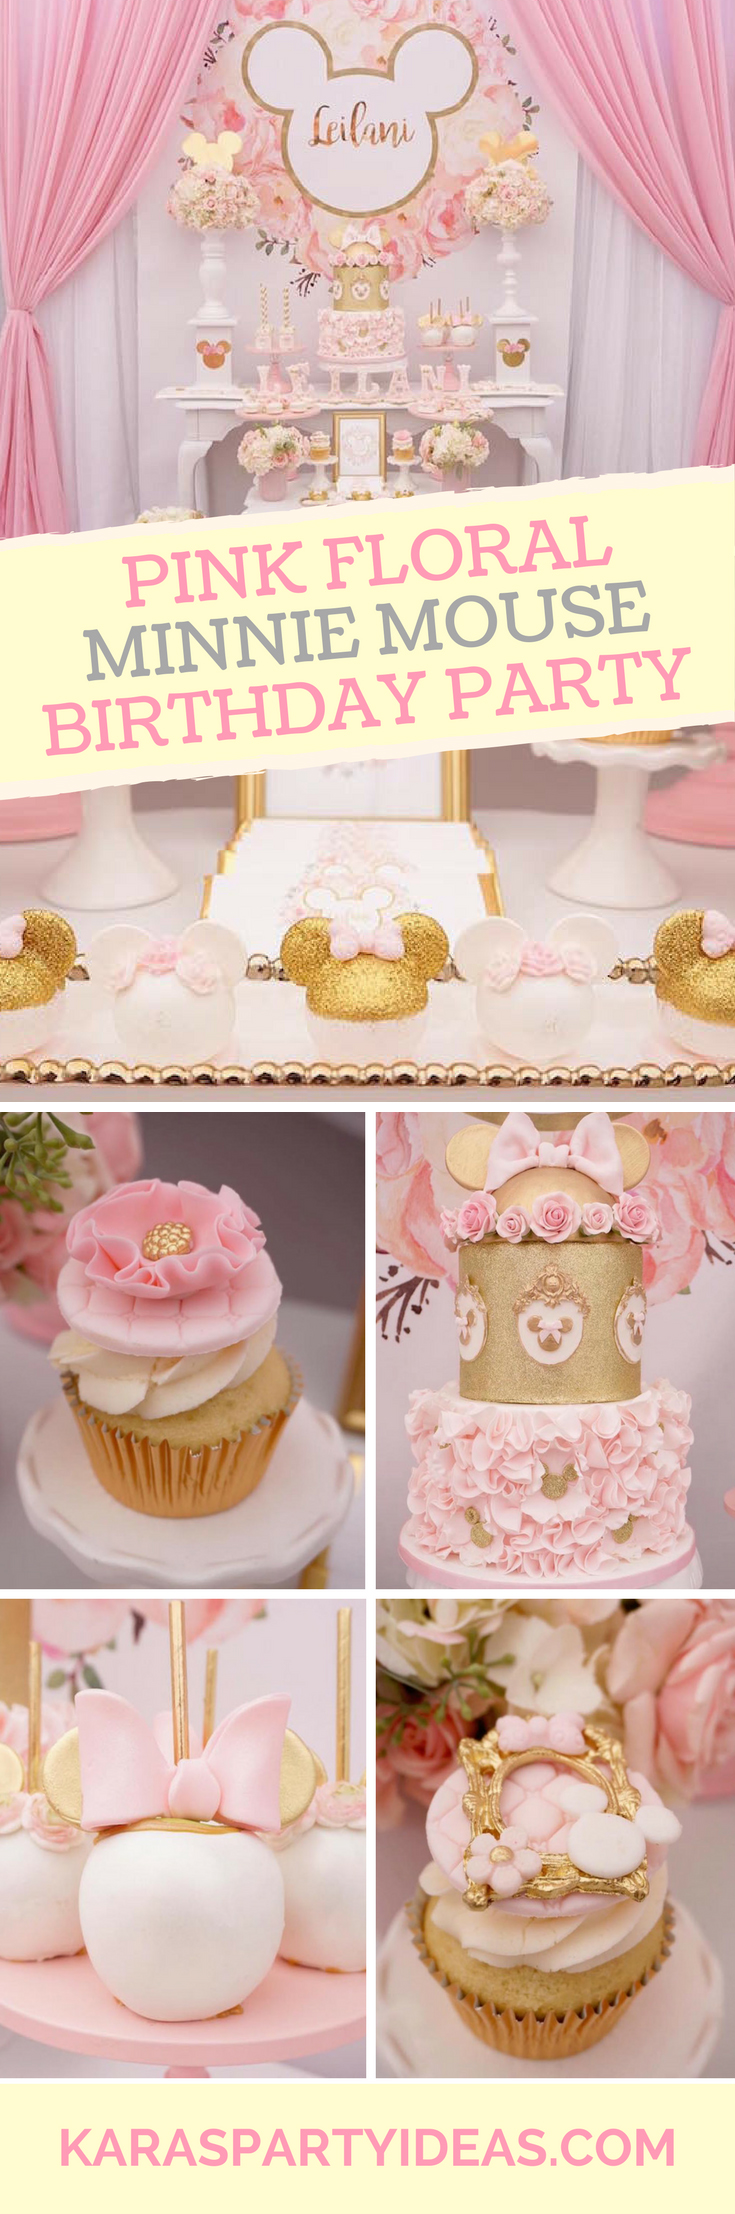 Karas party ideas pink floral minnie mouse birthday party karas pink floral minnie mouse birthday party via karas party ideas karaspartyideas izmirmasajfo